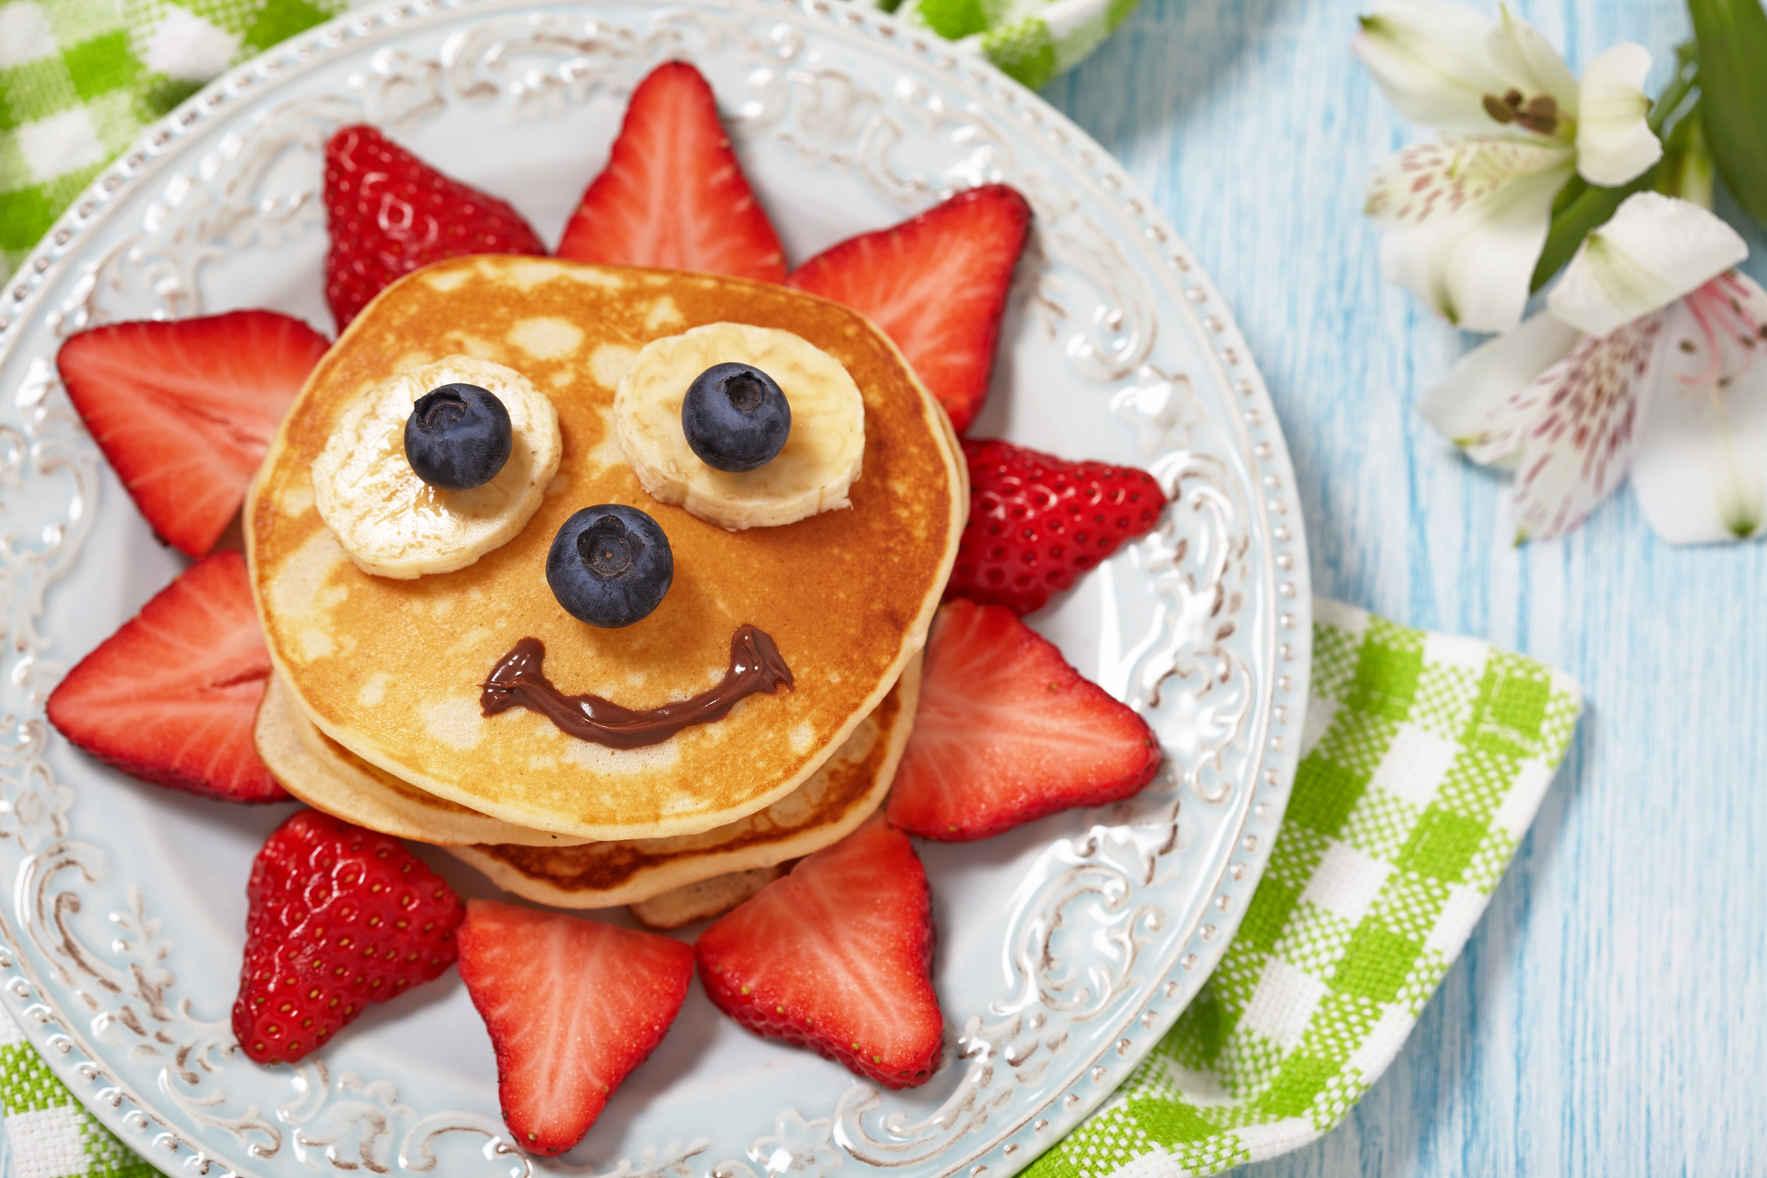 2020 SWOHF Annual Meeting & Volunteer Appreciation Breakfast image